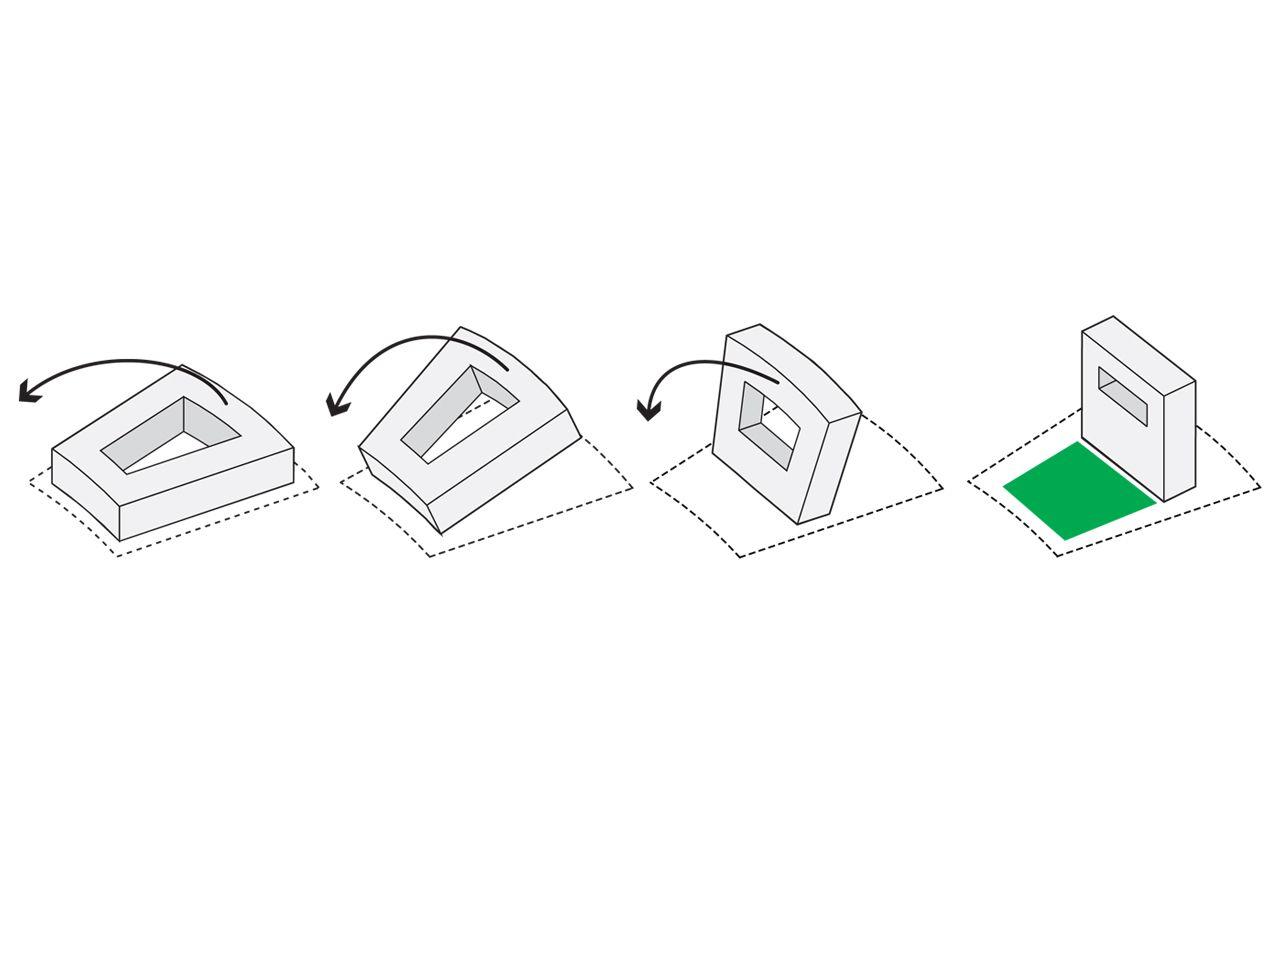 raid 5 concept with diagram cub cadet deck belt mvrdv mirador urban coagulate pinterest